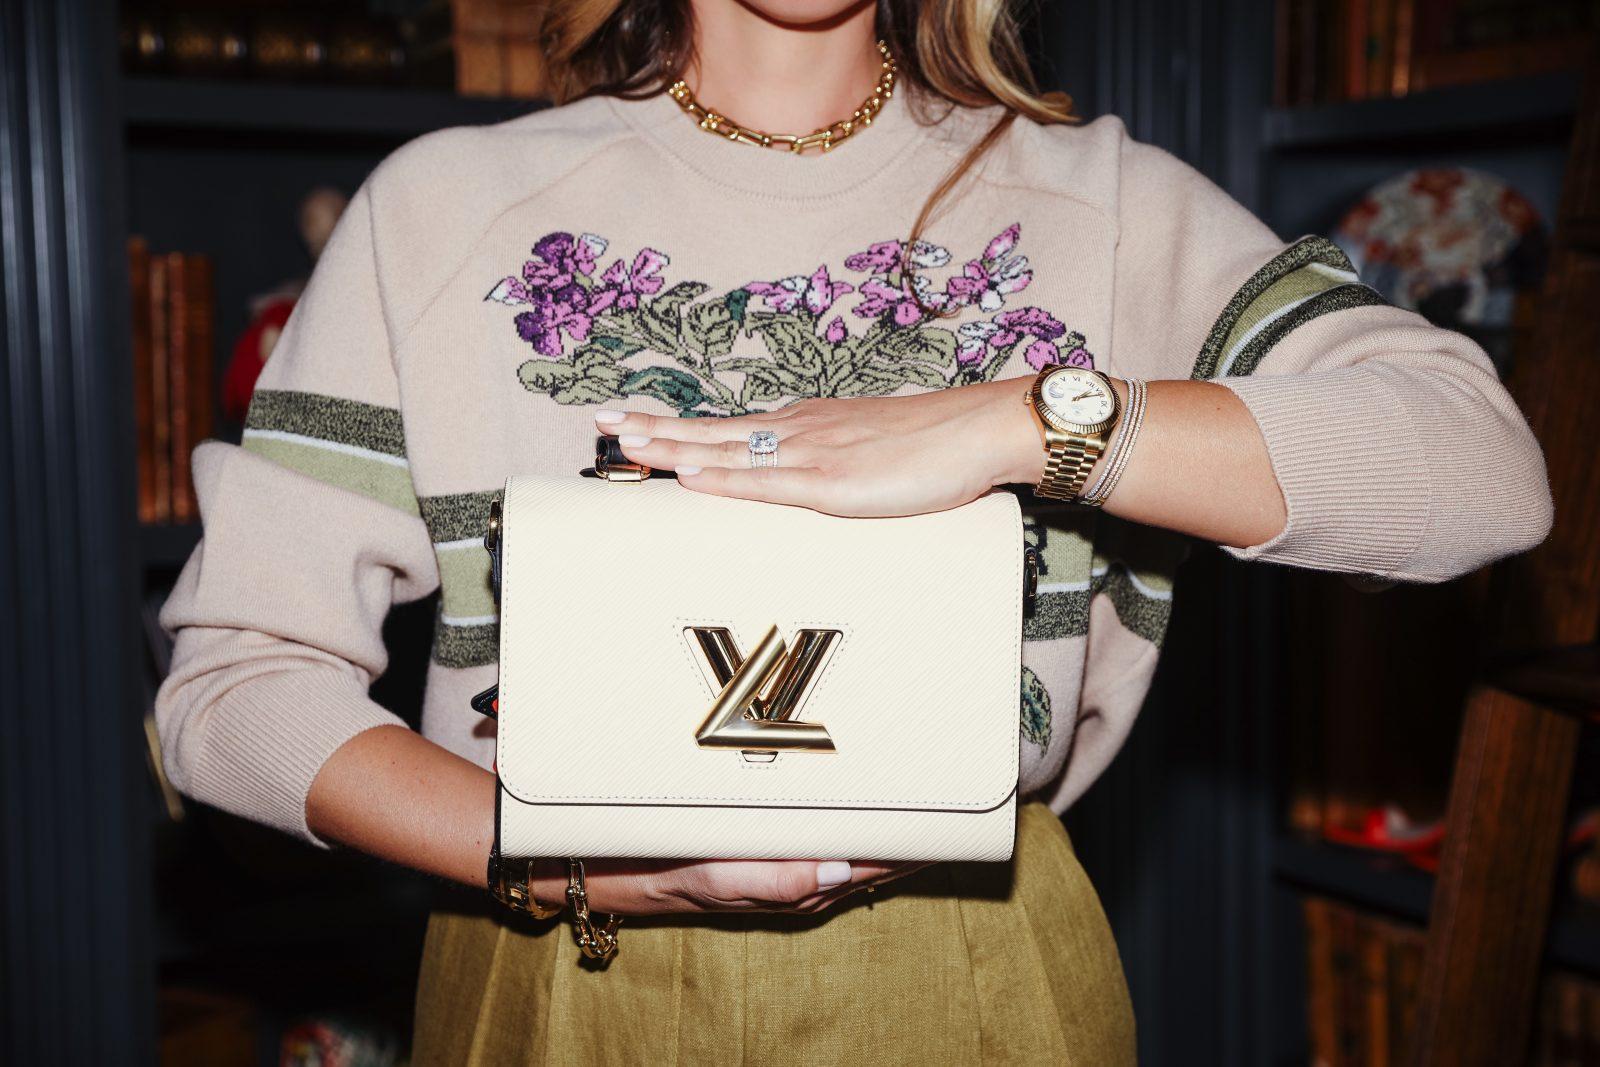 Elizabeth Allen handbag photoshoot by Alaina Mullin